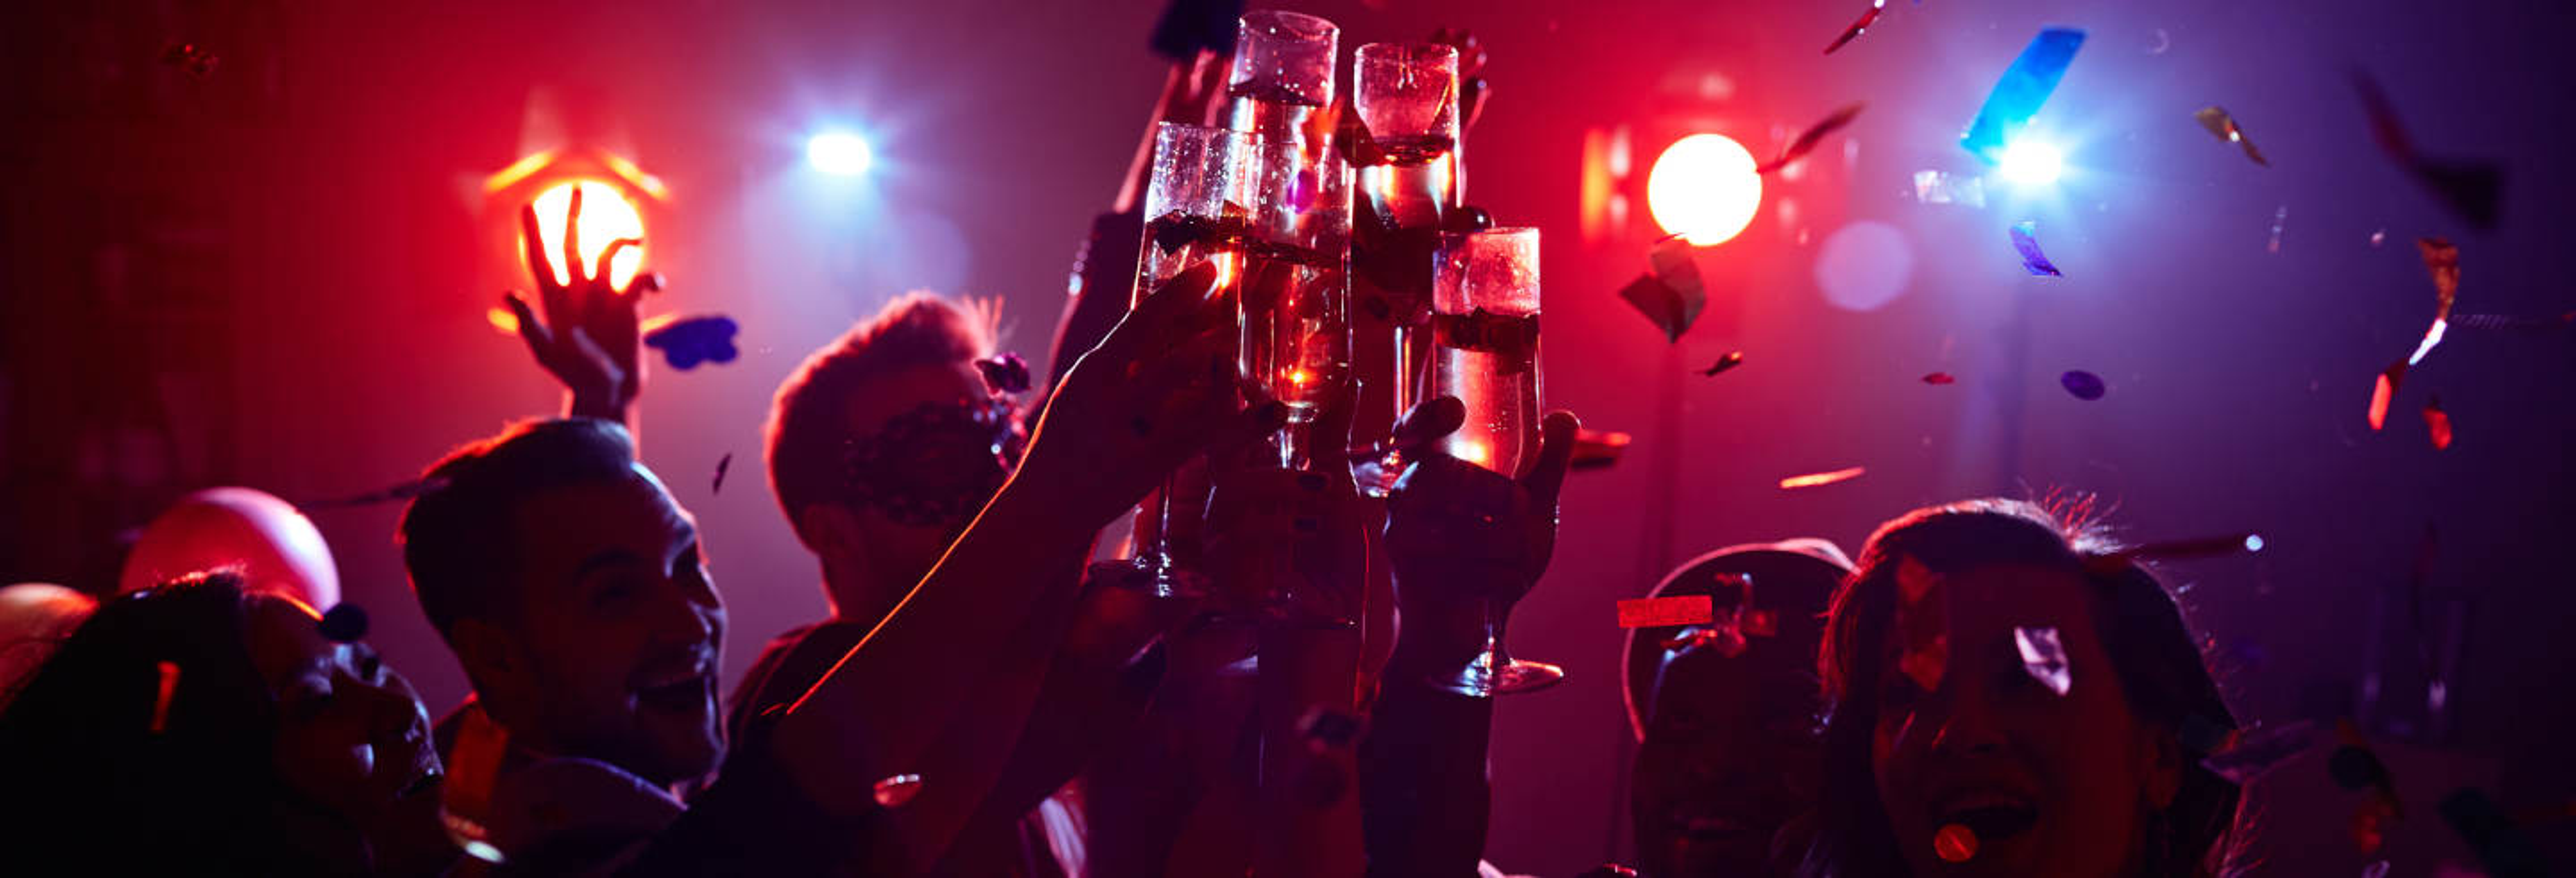 Pub Crawl ¡Tour de fiesta por Amritsar!